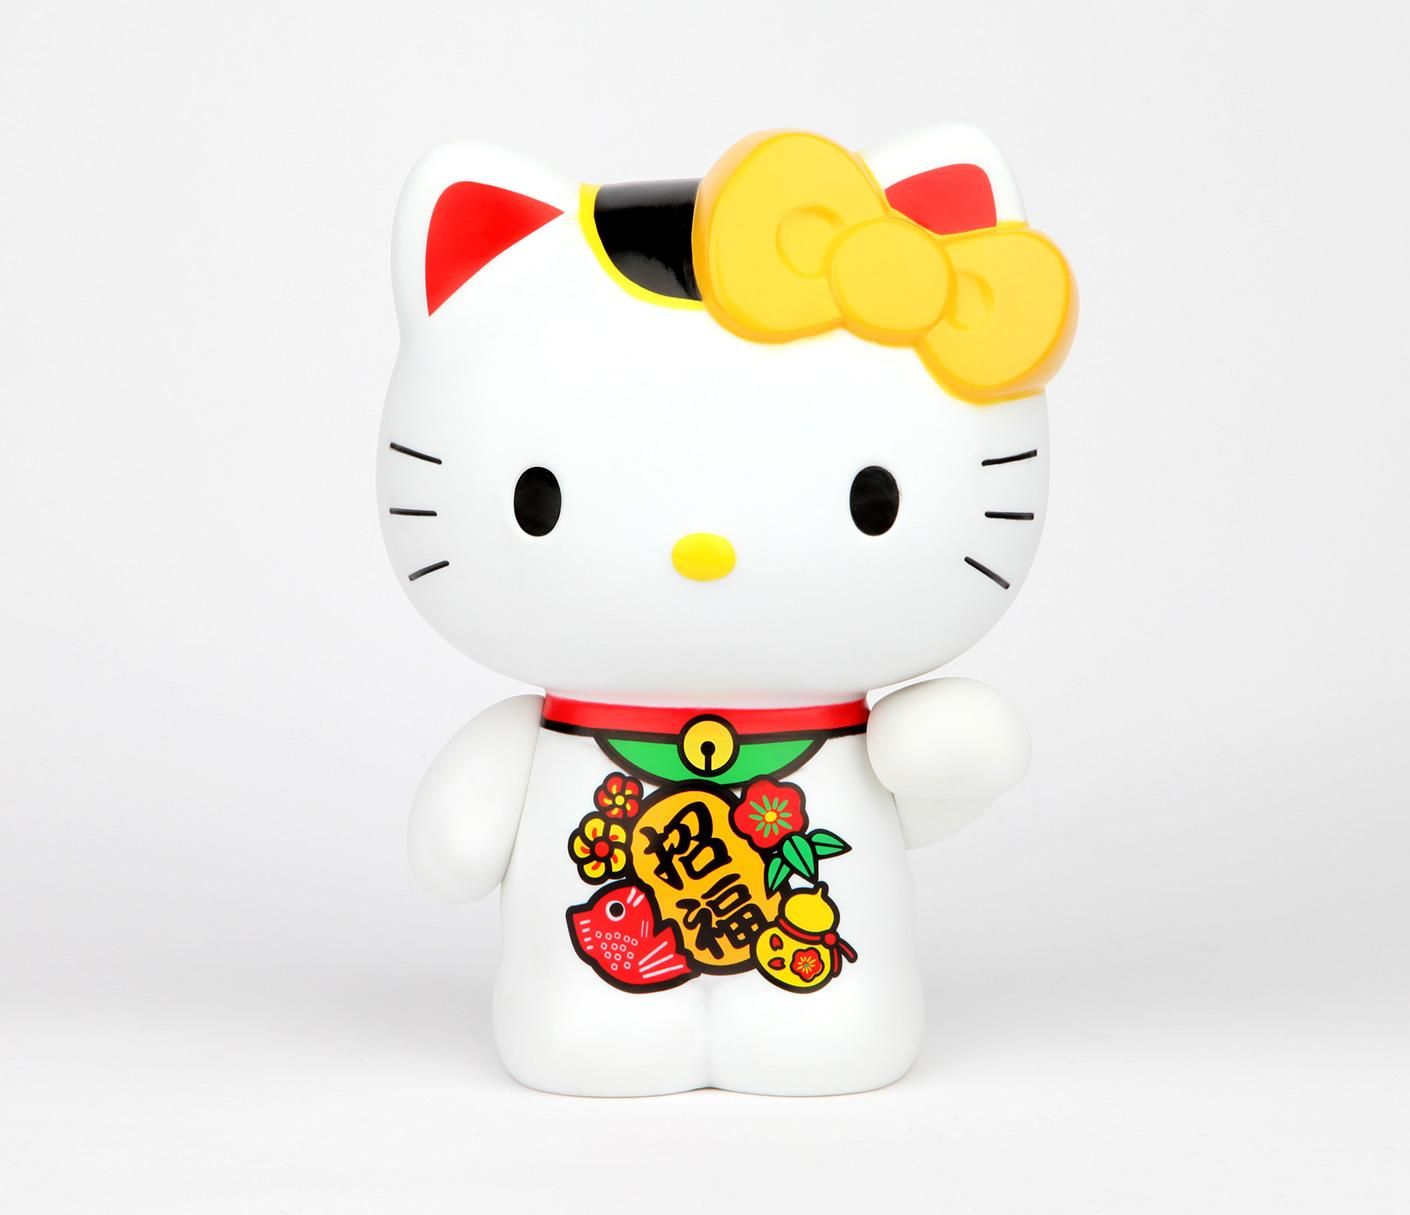 89815-201306.a.zoom.jpg (1410×1215) | cute | Pinterest | Hello kitty ...